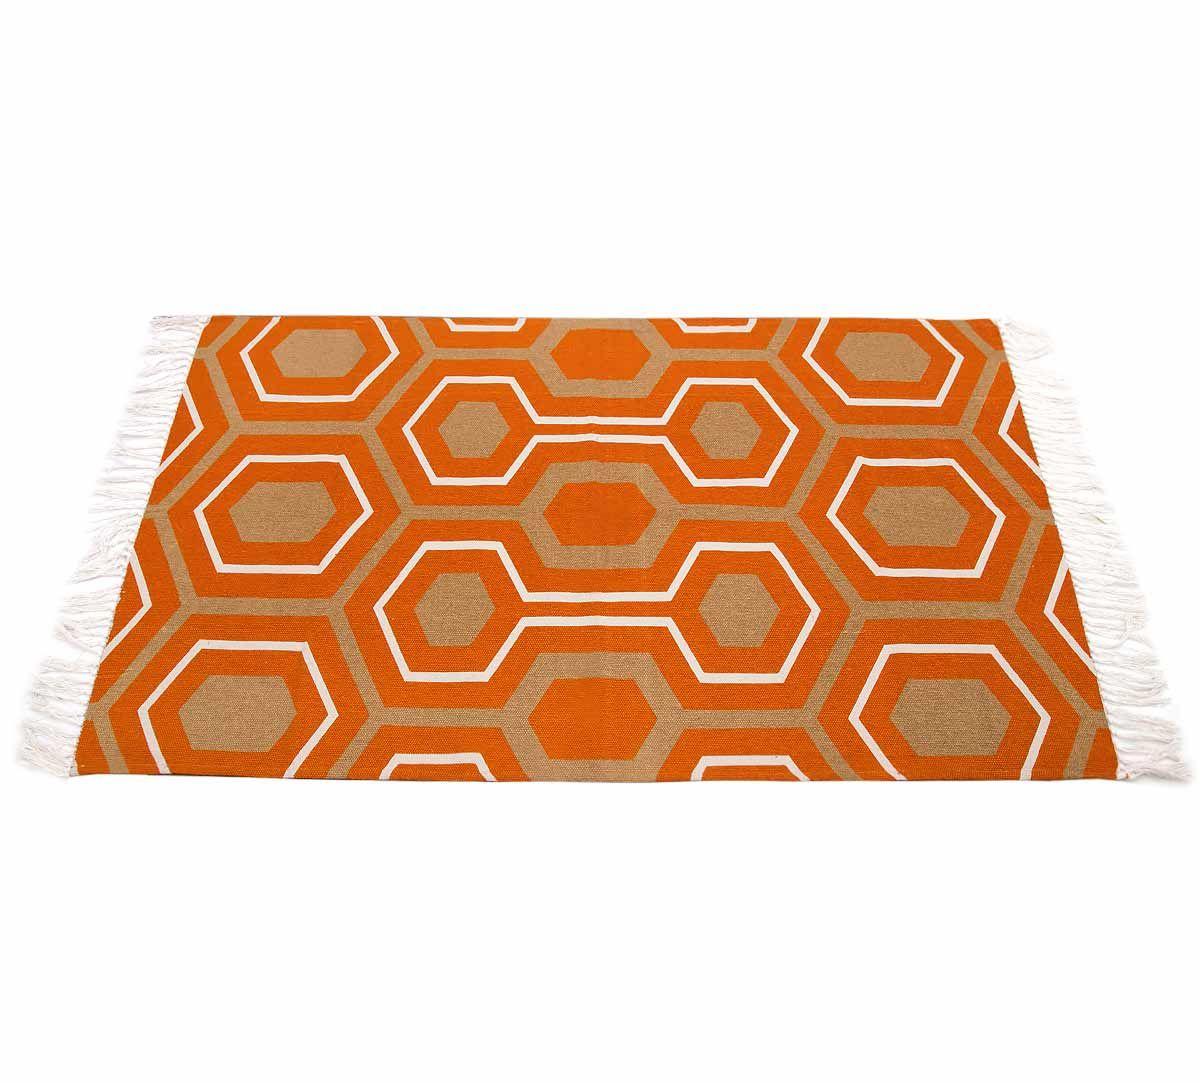 India Circus Prismatic Hexagons Rug